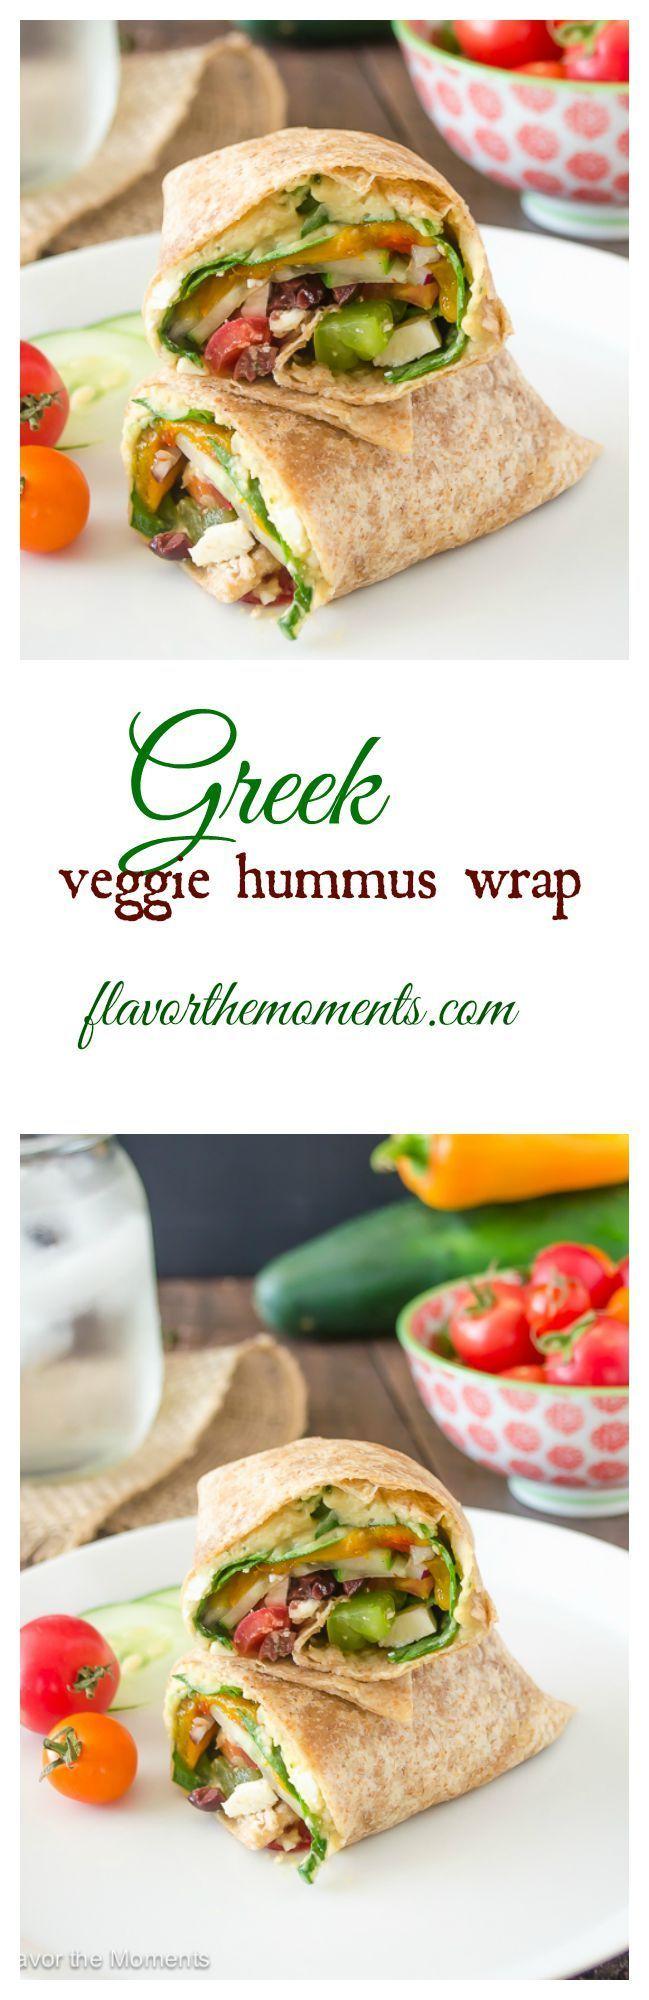 Greek Veggie Hummus Wrap   flavorthemoments.com